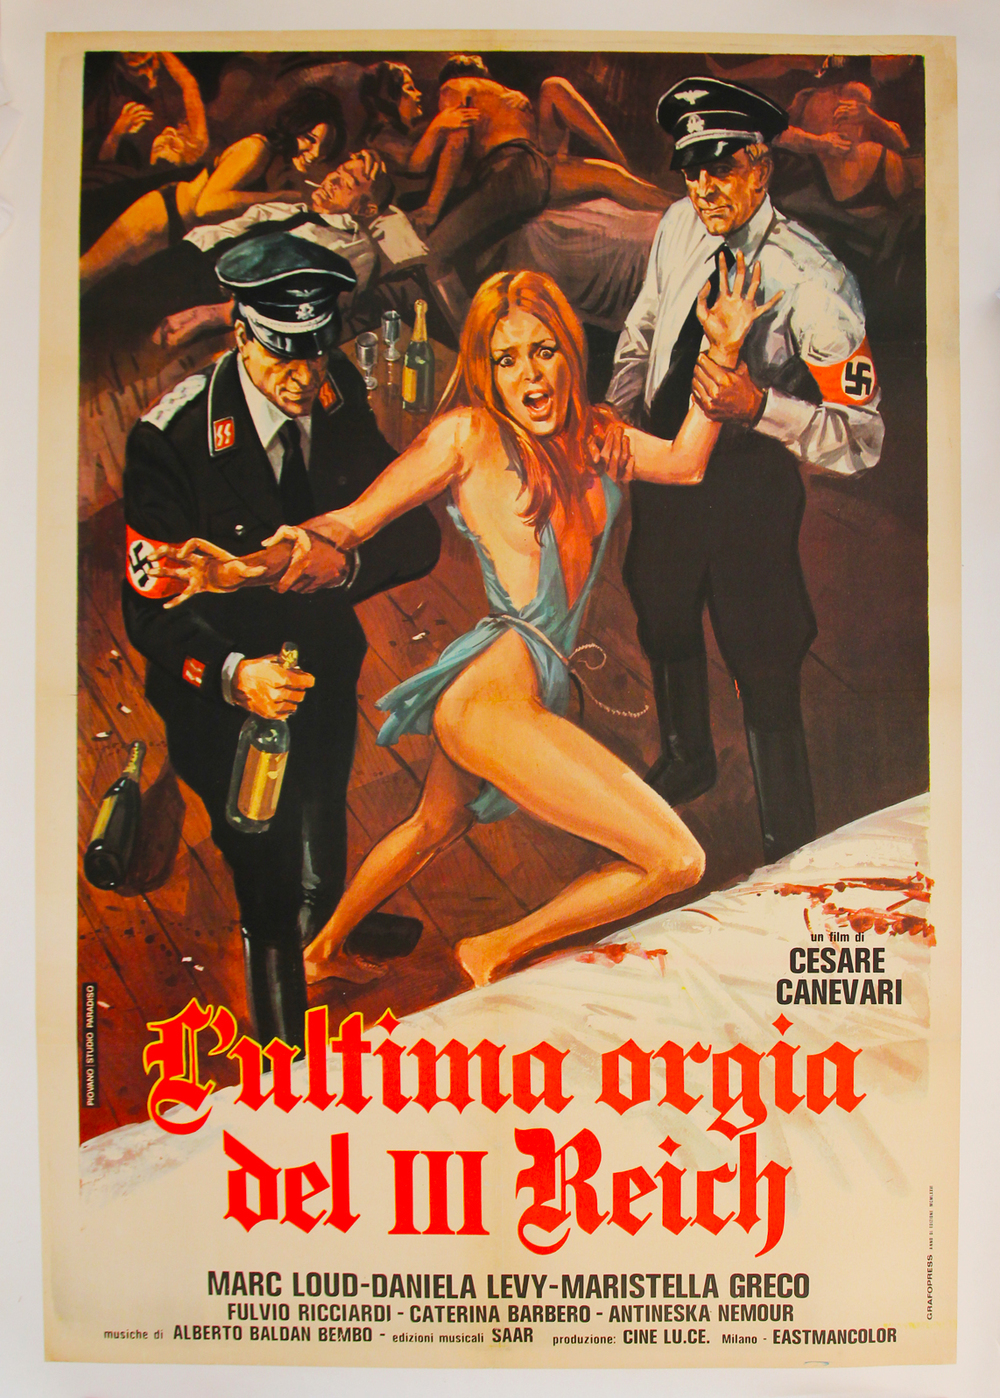 Gestapo's Last Orgy - Italian 2F Manifesto